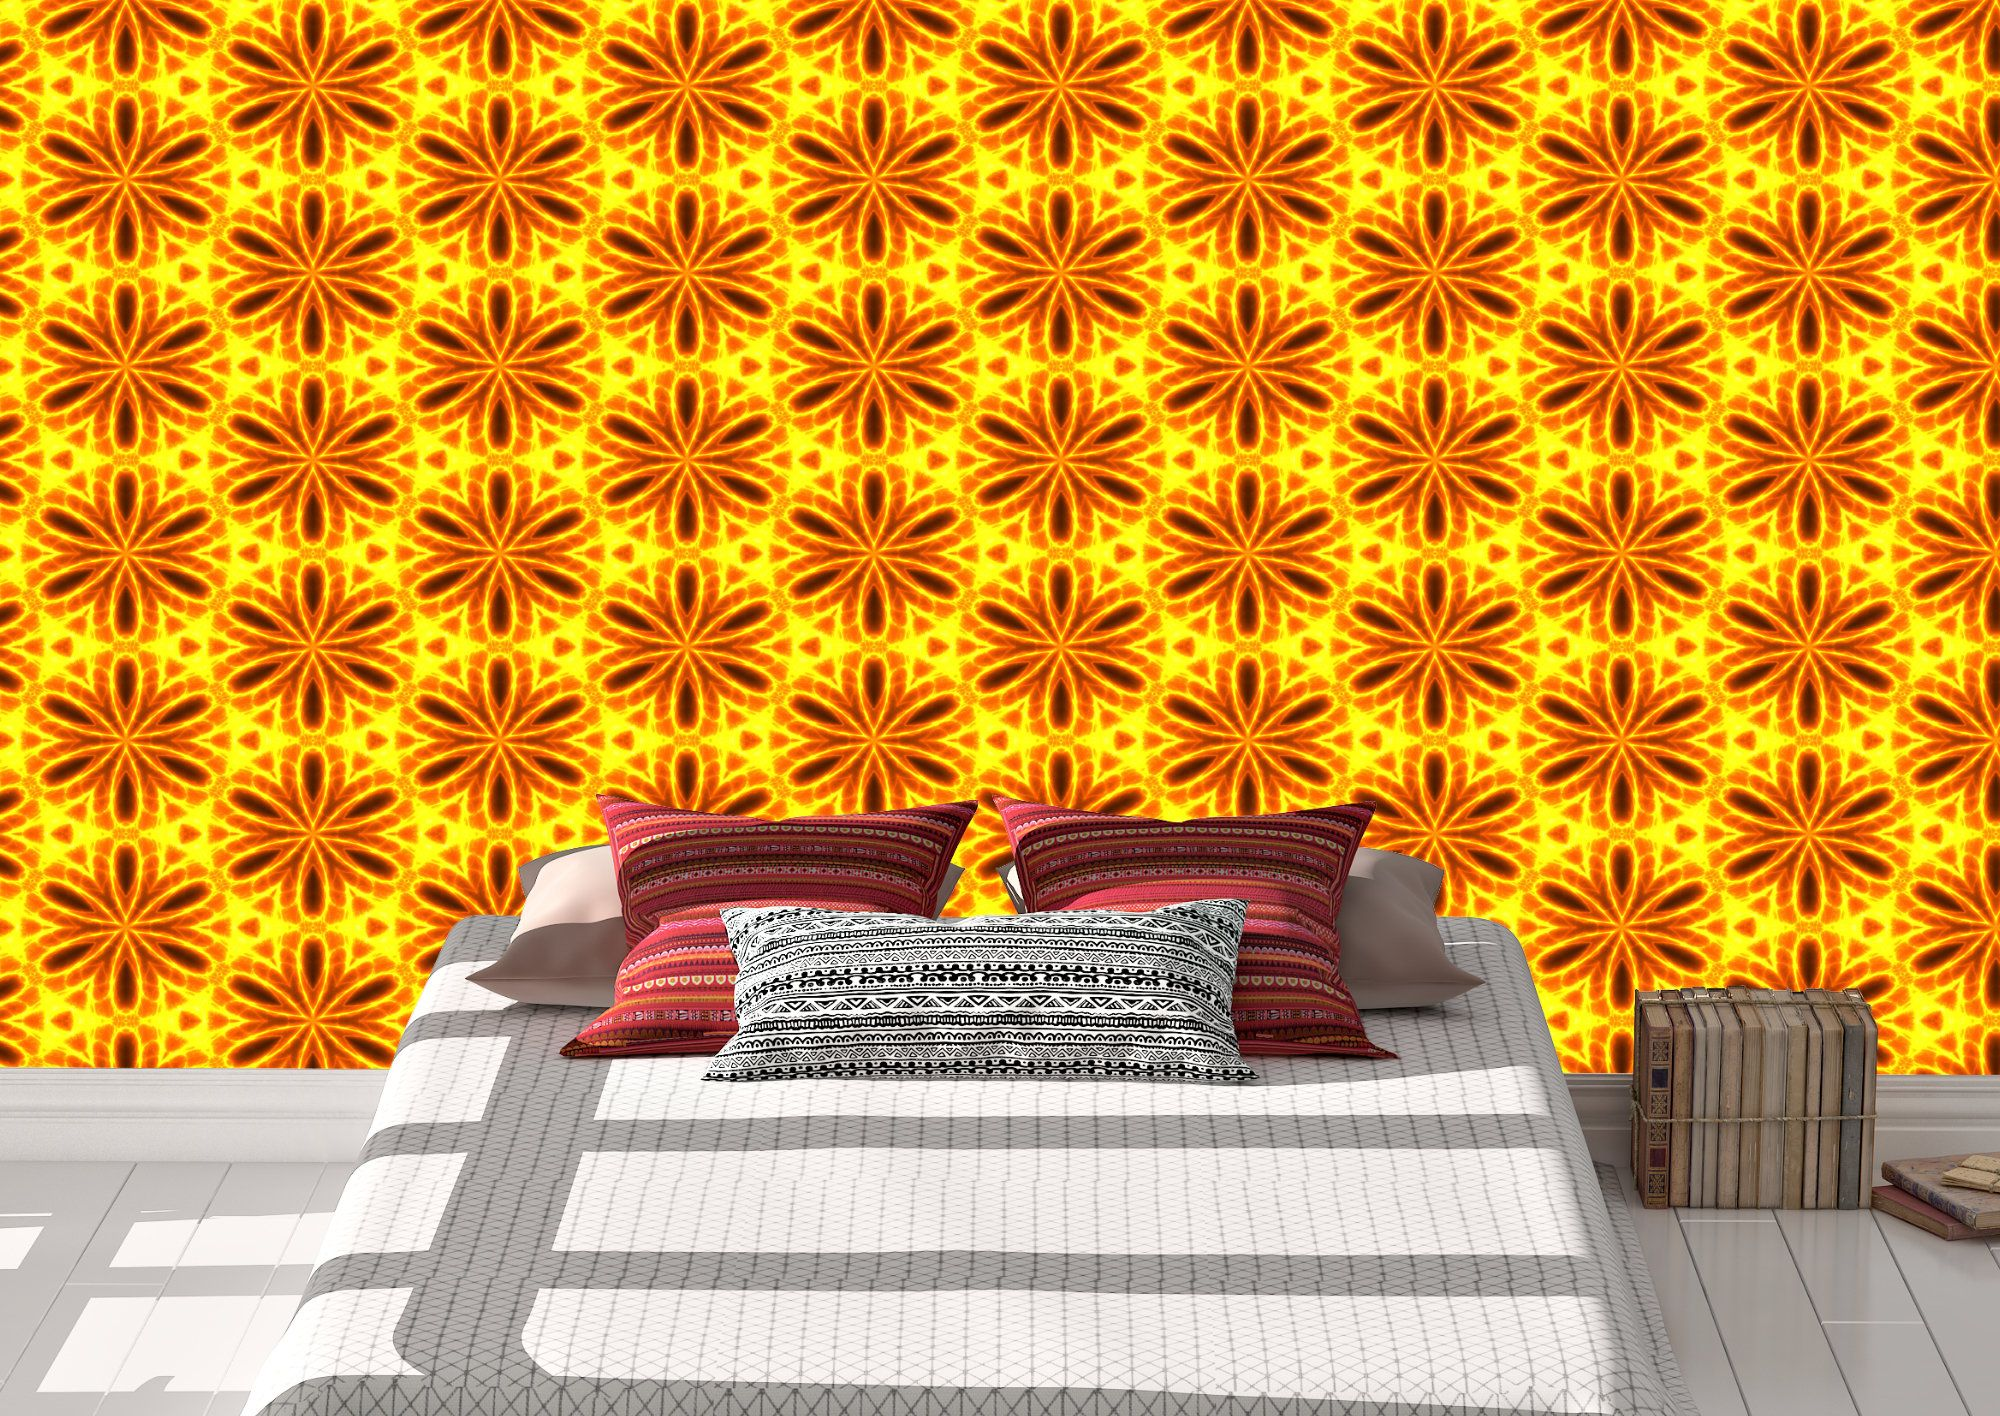 Burnt Orange Flowers Wallpaper Peel and Stick Removeable